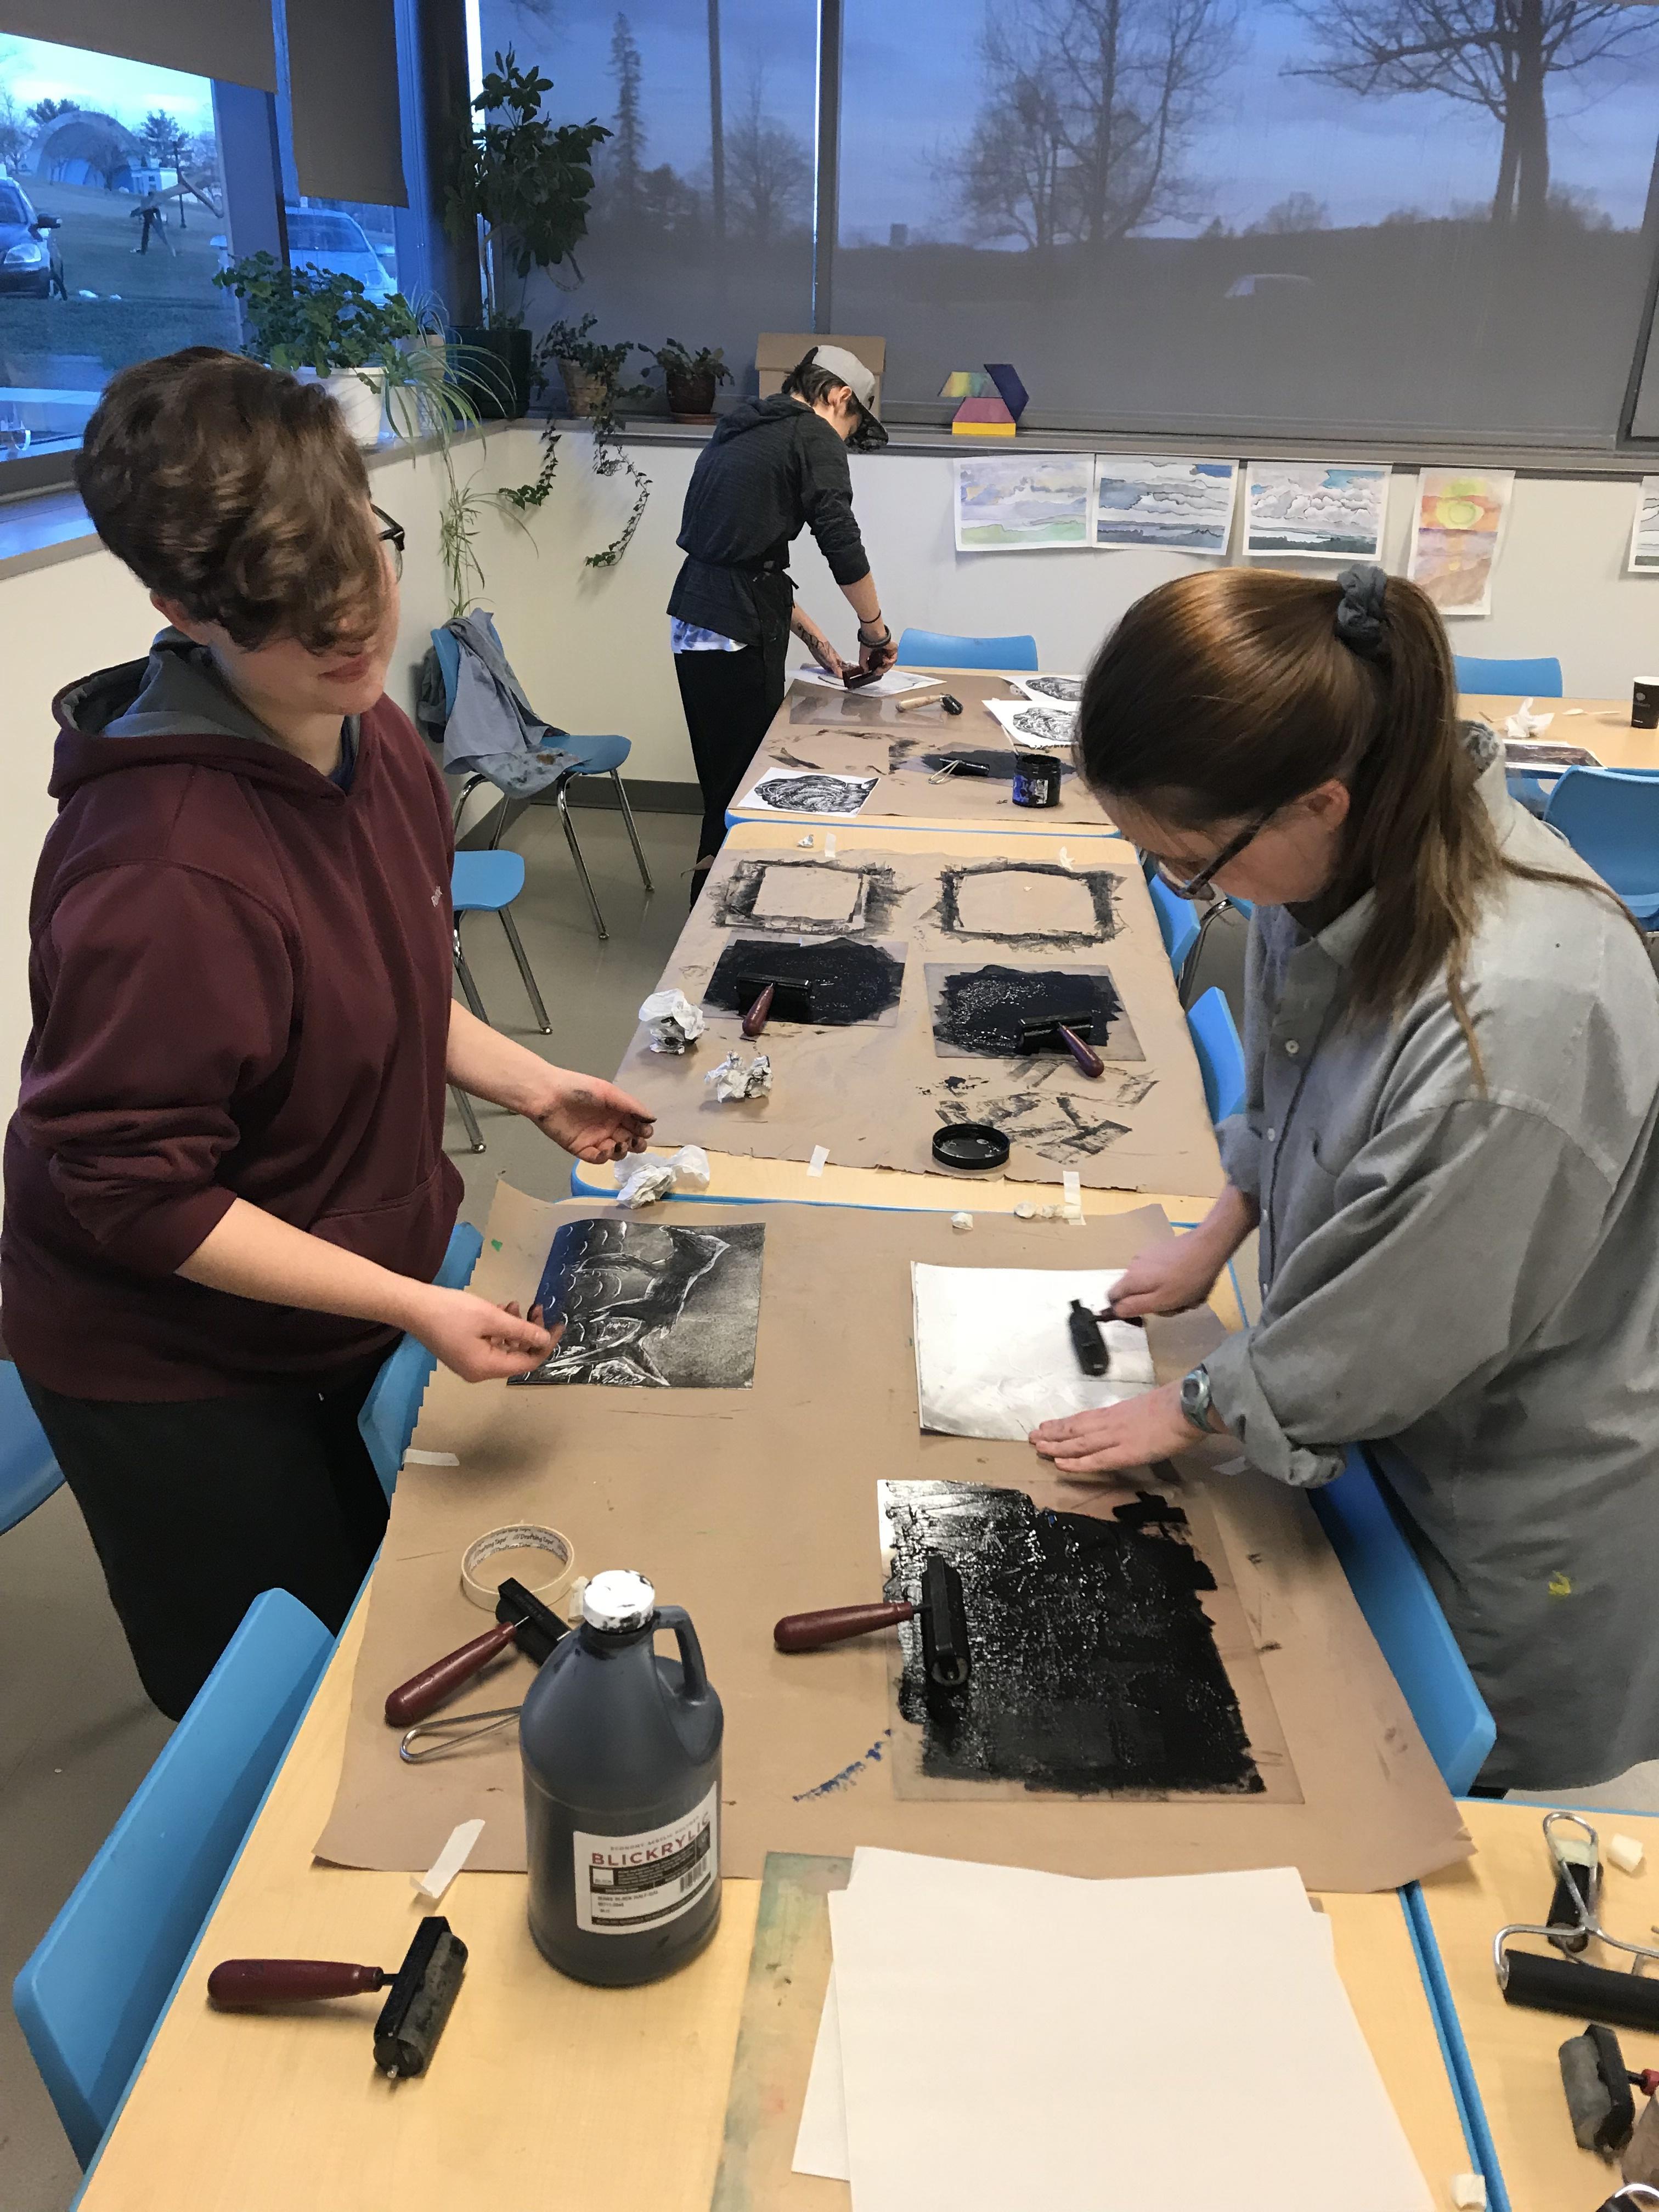 Students creating monotype prints in the studio